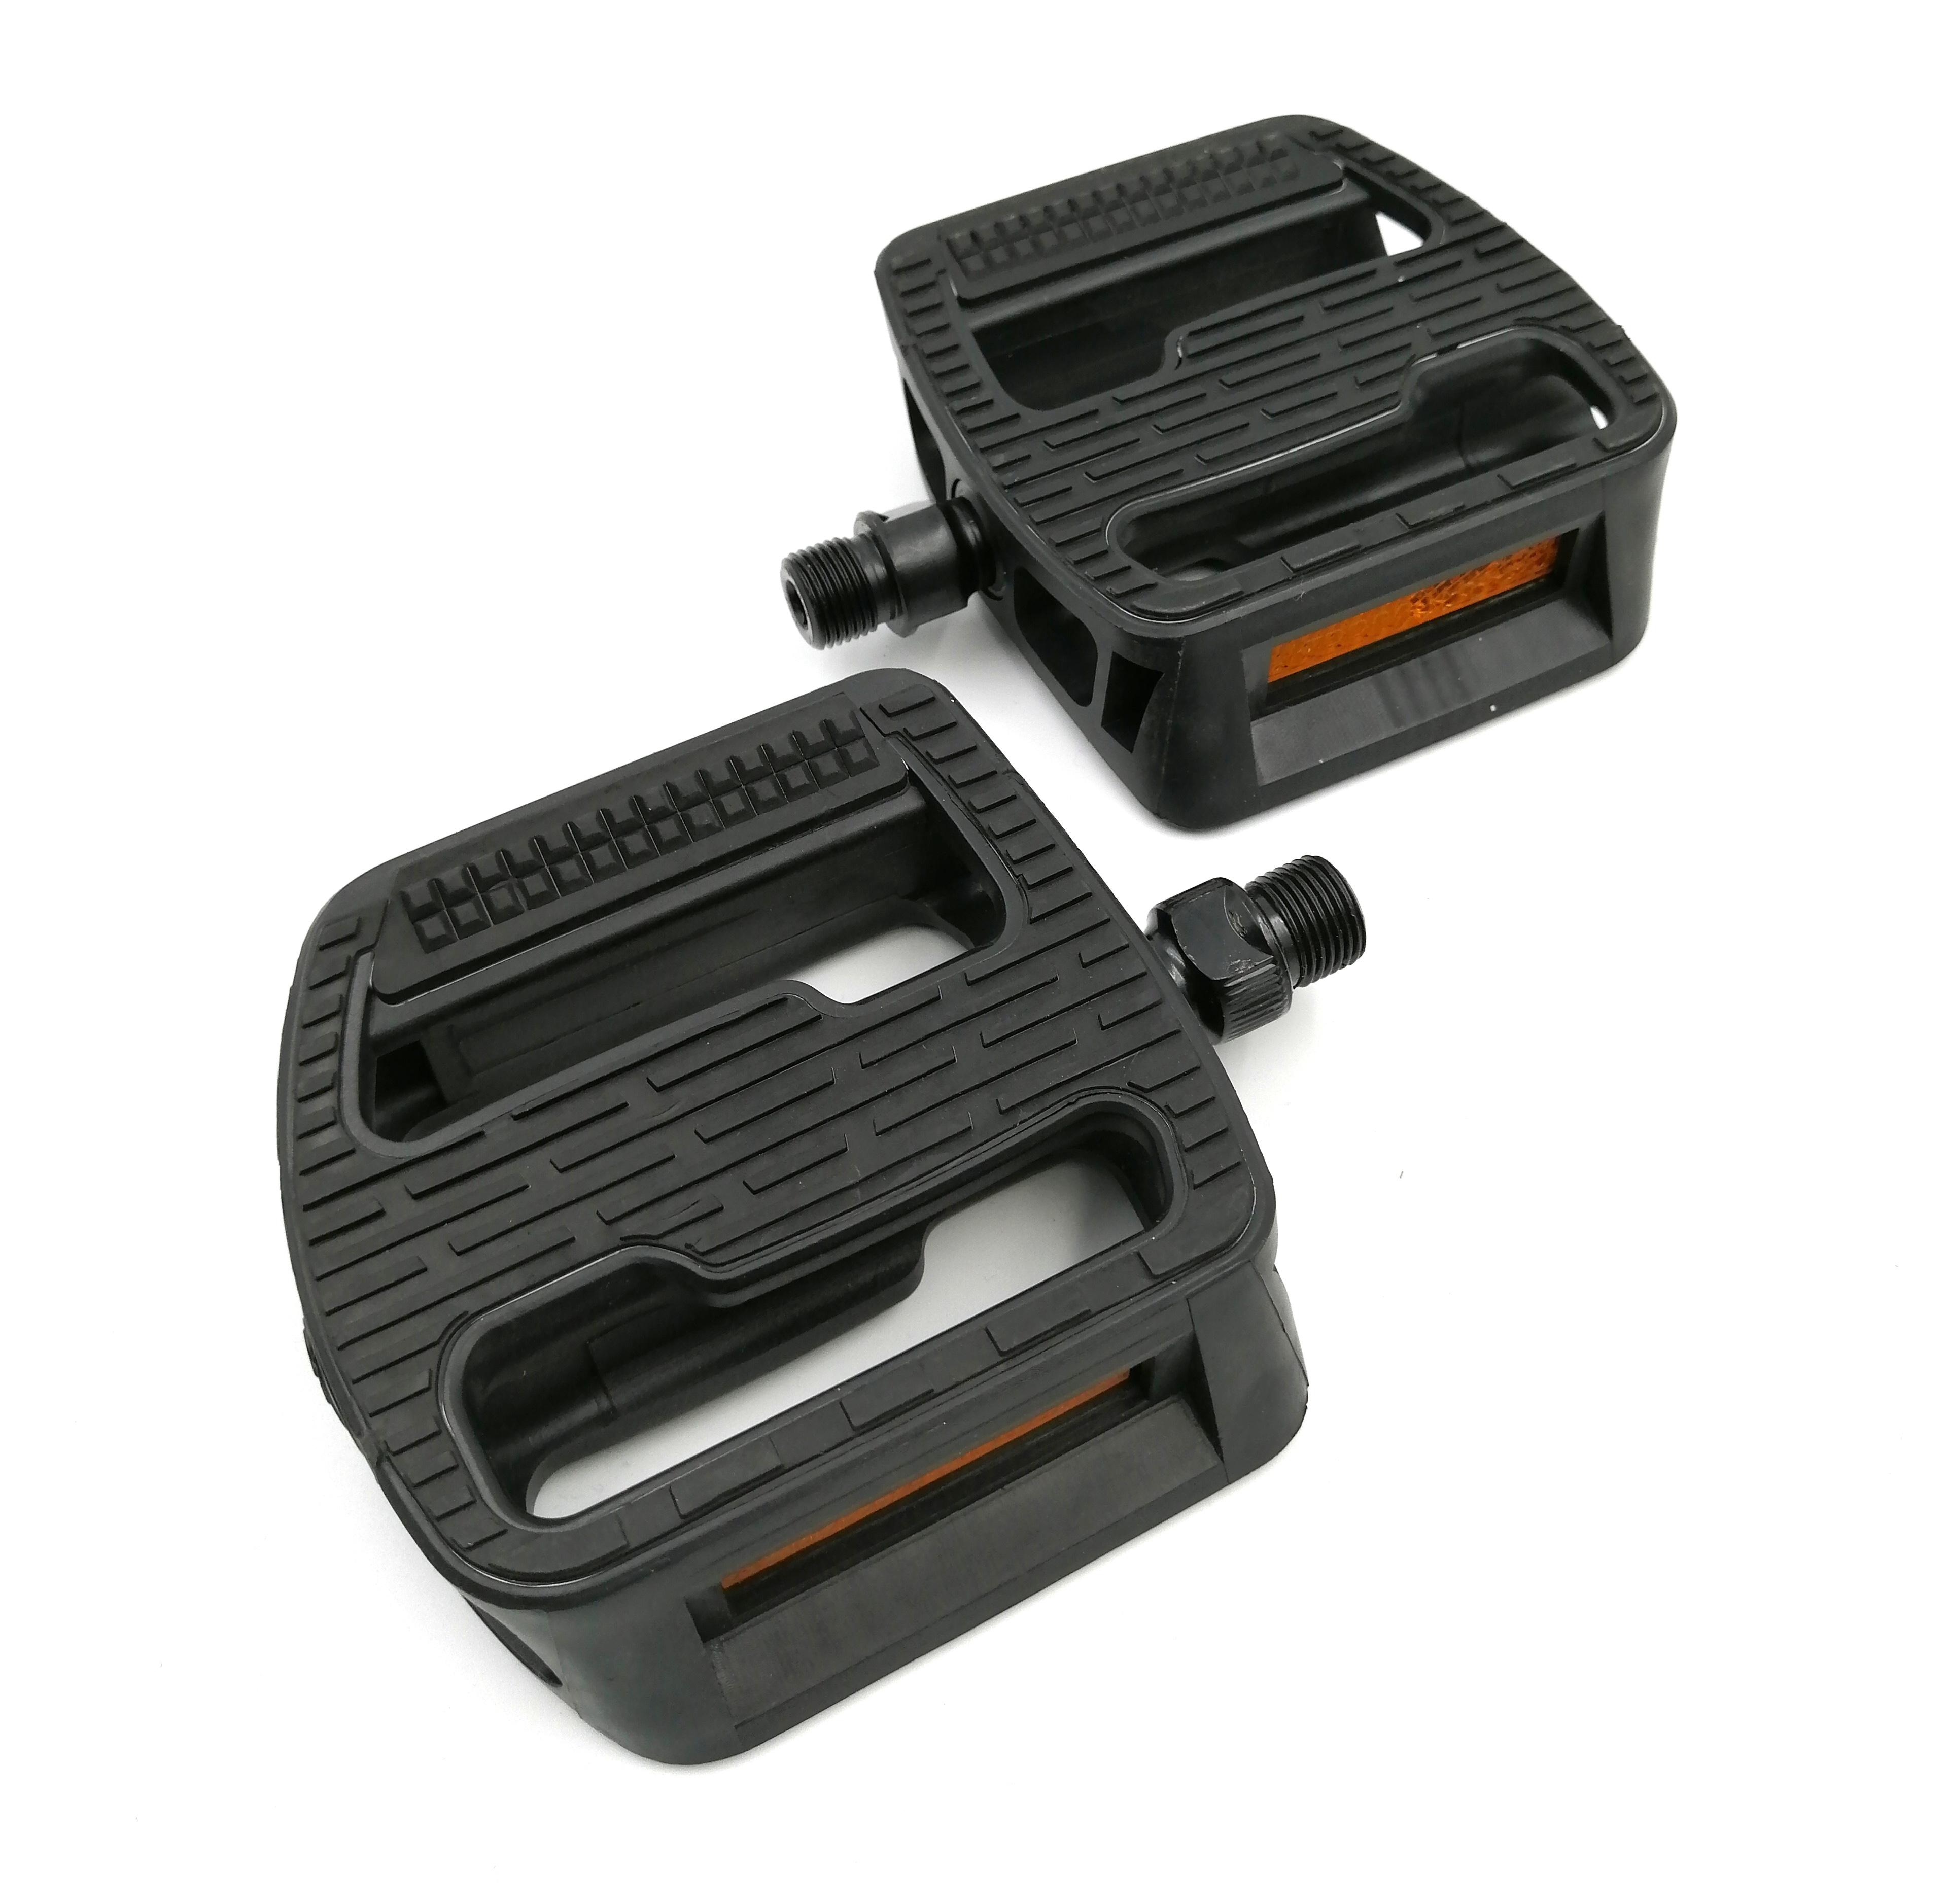 PEDALE FPD NW-467 PP black body/Black rubber/Boron axle 110x97x23mm